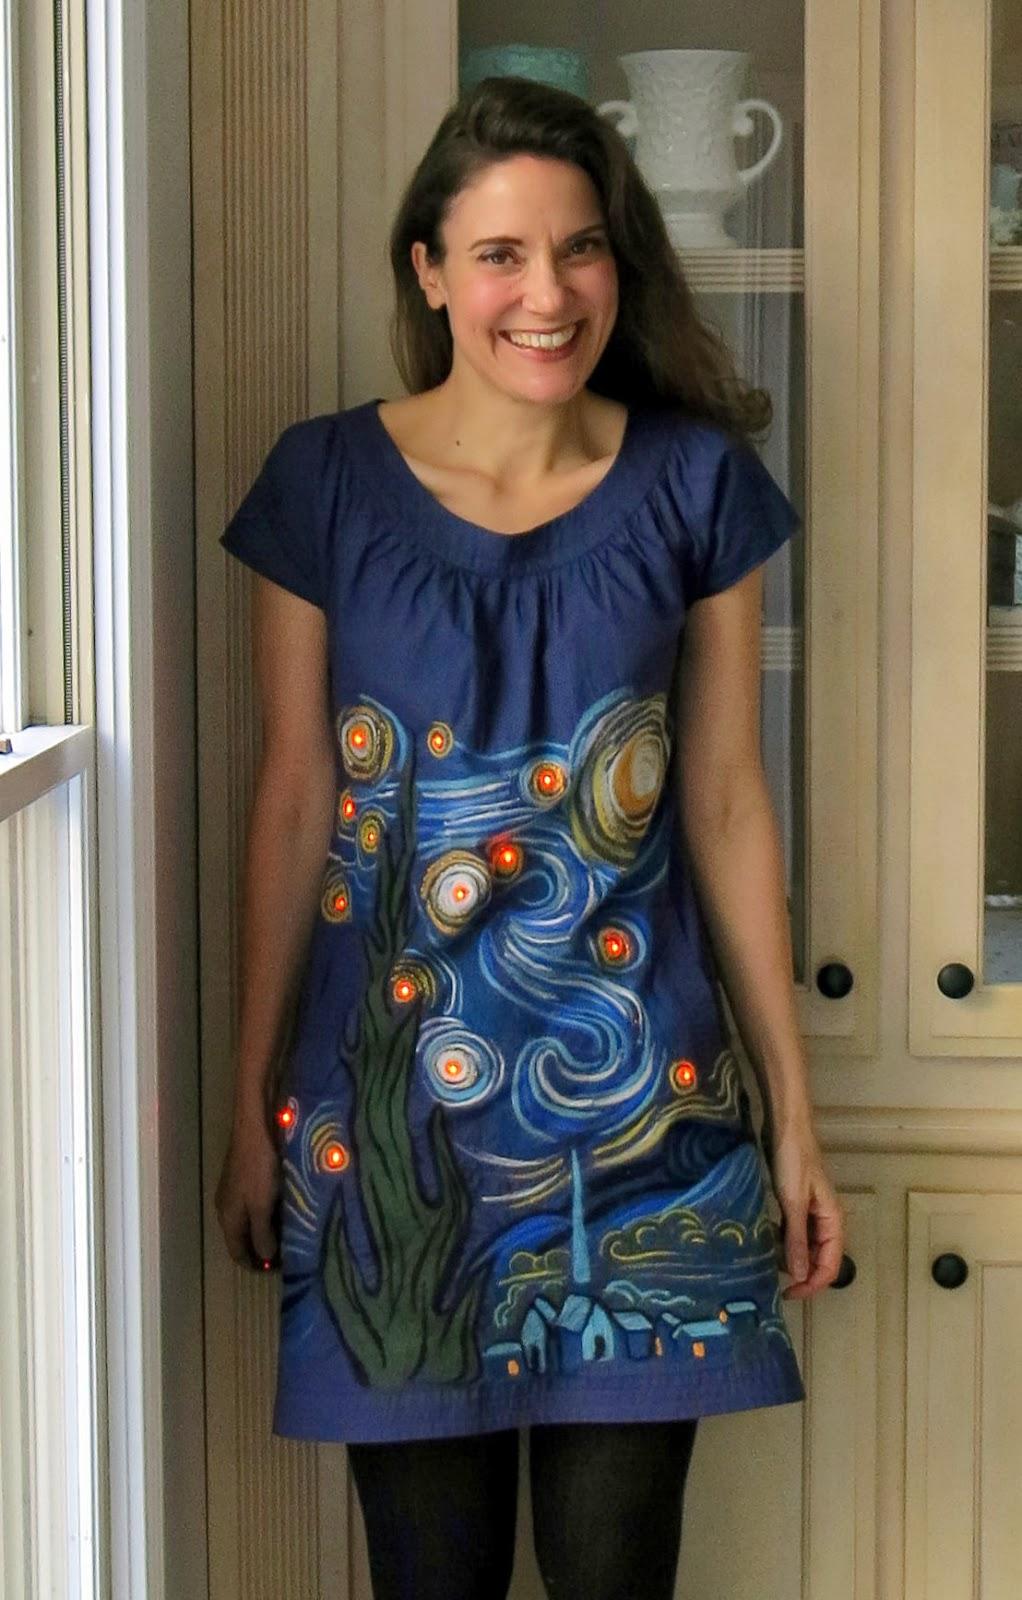 Cassie Stephens Diy A Felted Light Up Starry Night Dress